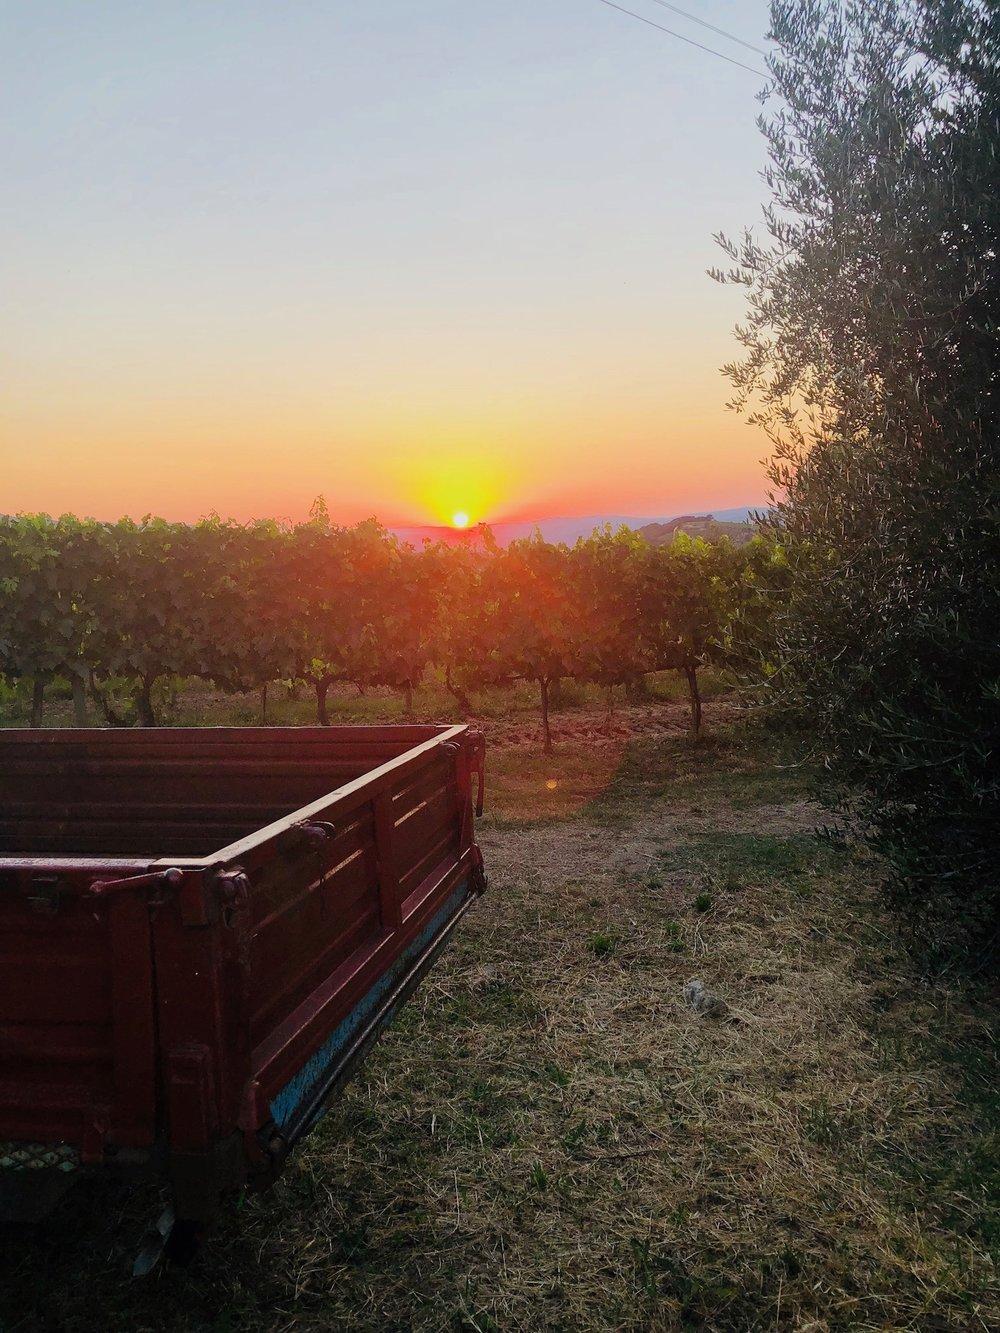 Goodbye, Tuscany. We ❤️ you.